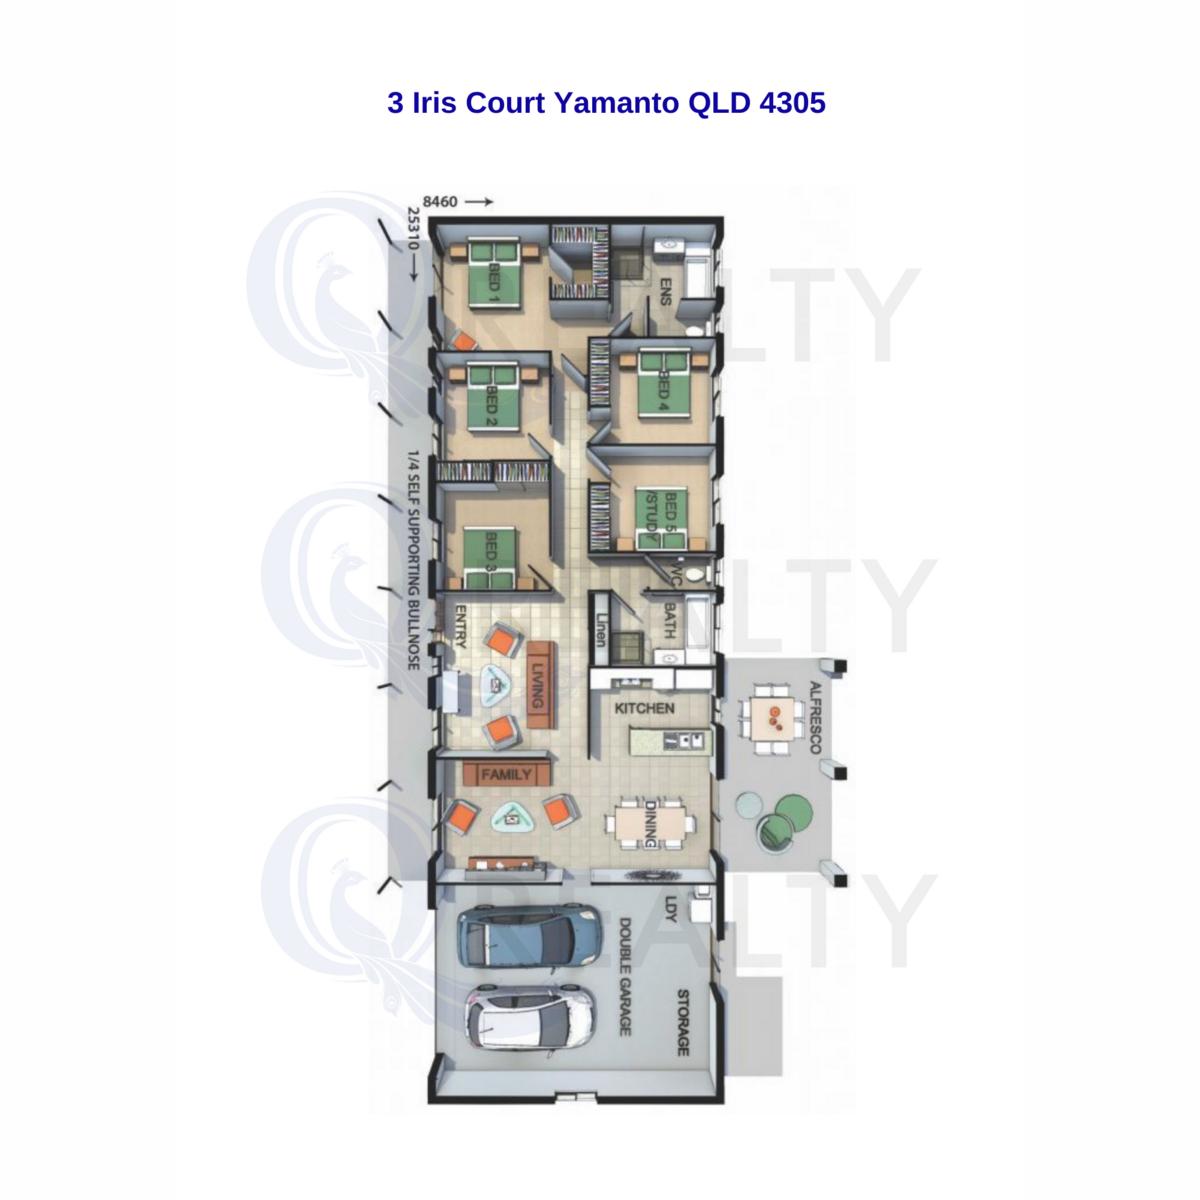 3 Iris Court, Yamanto  QLD  4305